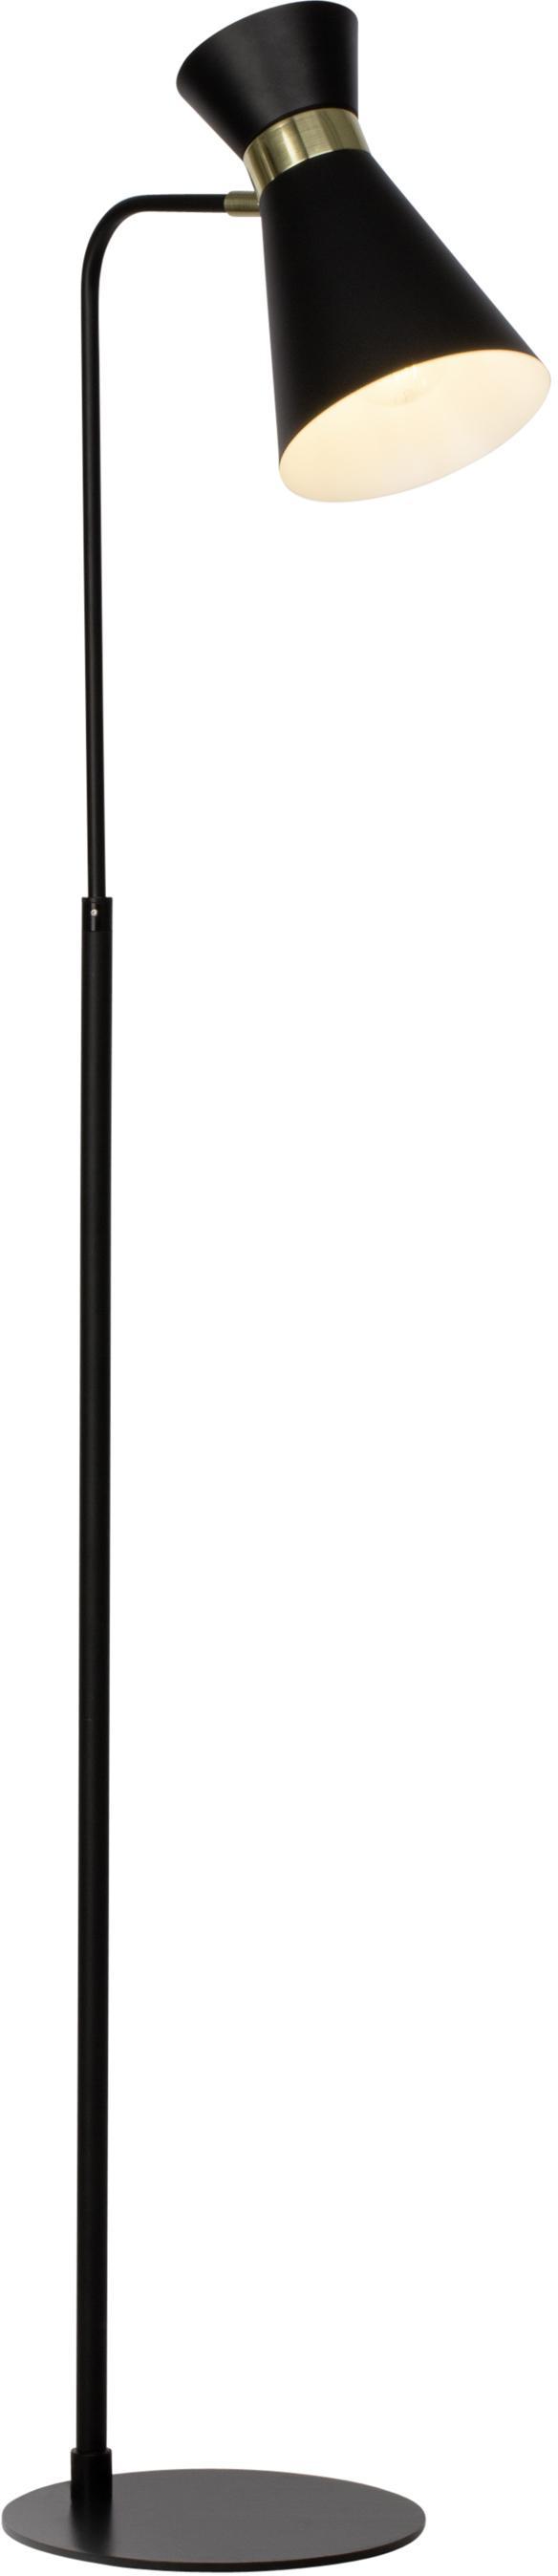 Lámpara de pie de metal Grazia, estilo retro, Pantalla: metal pintado, Negro, dorado, An 39 x Al 144 cm